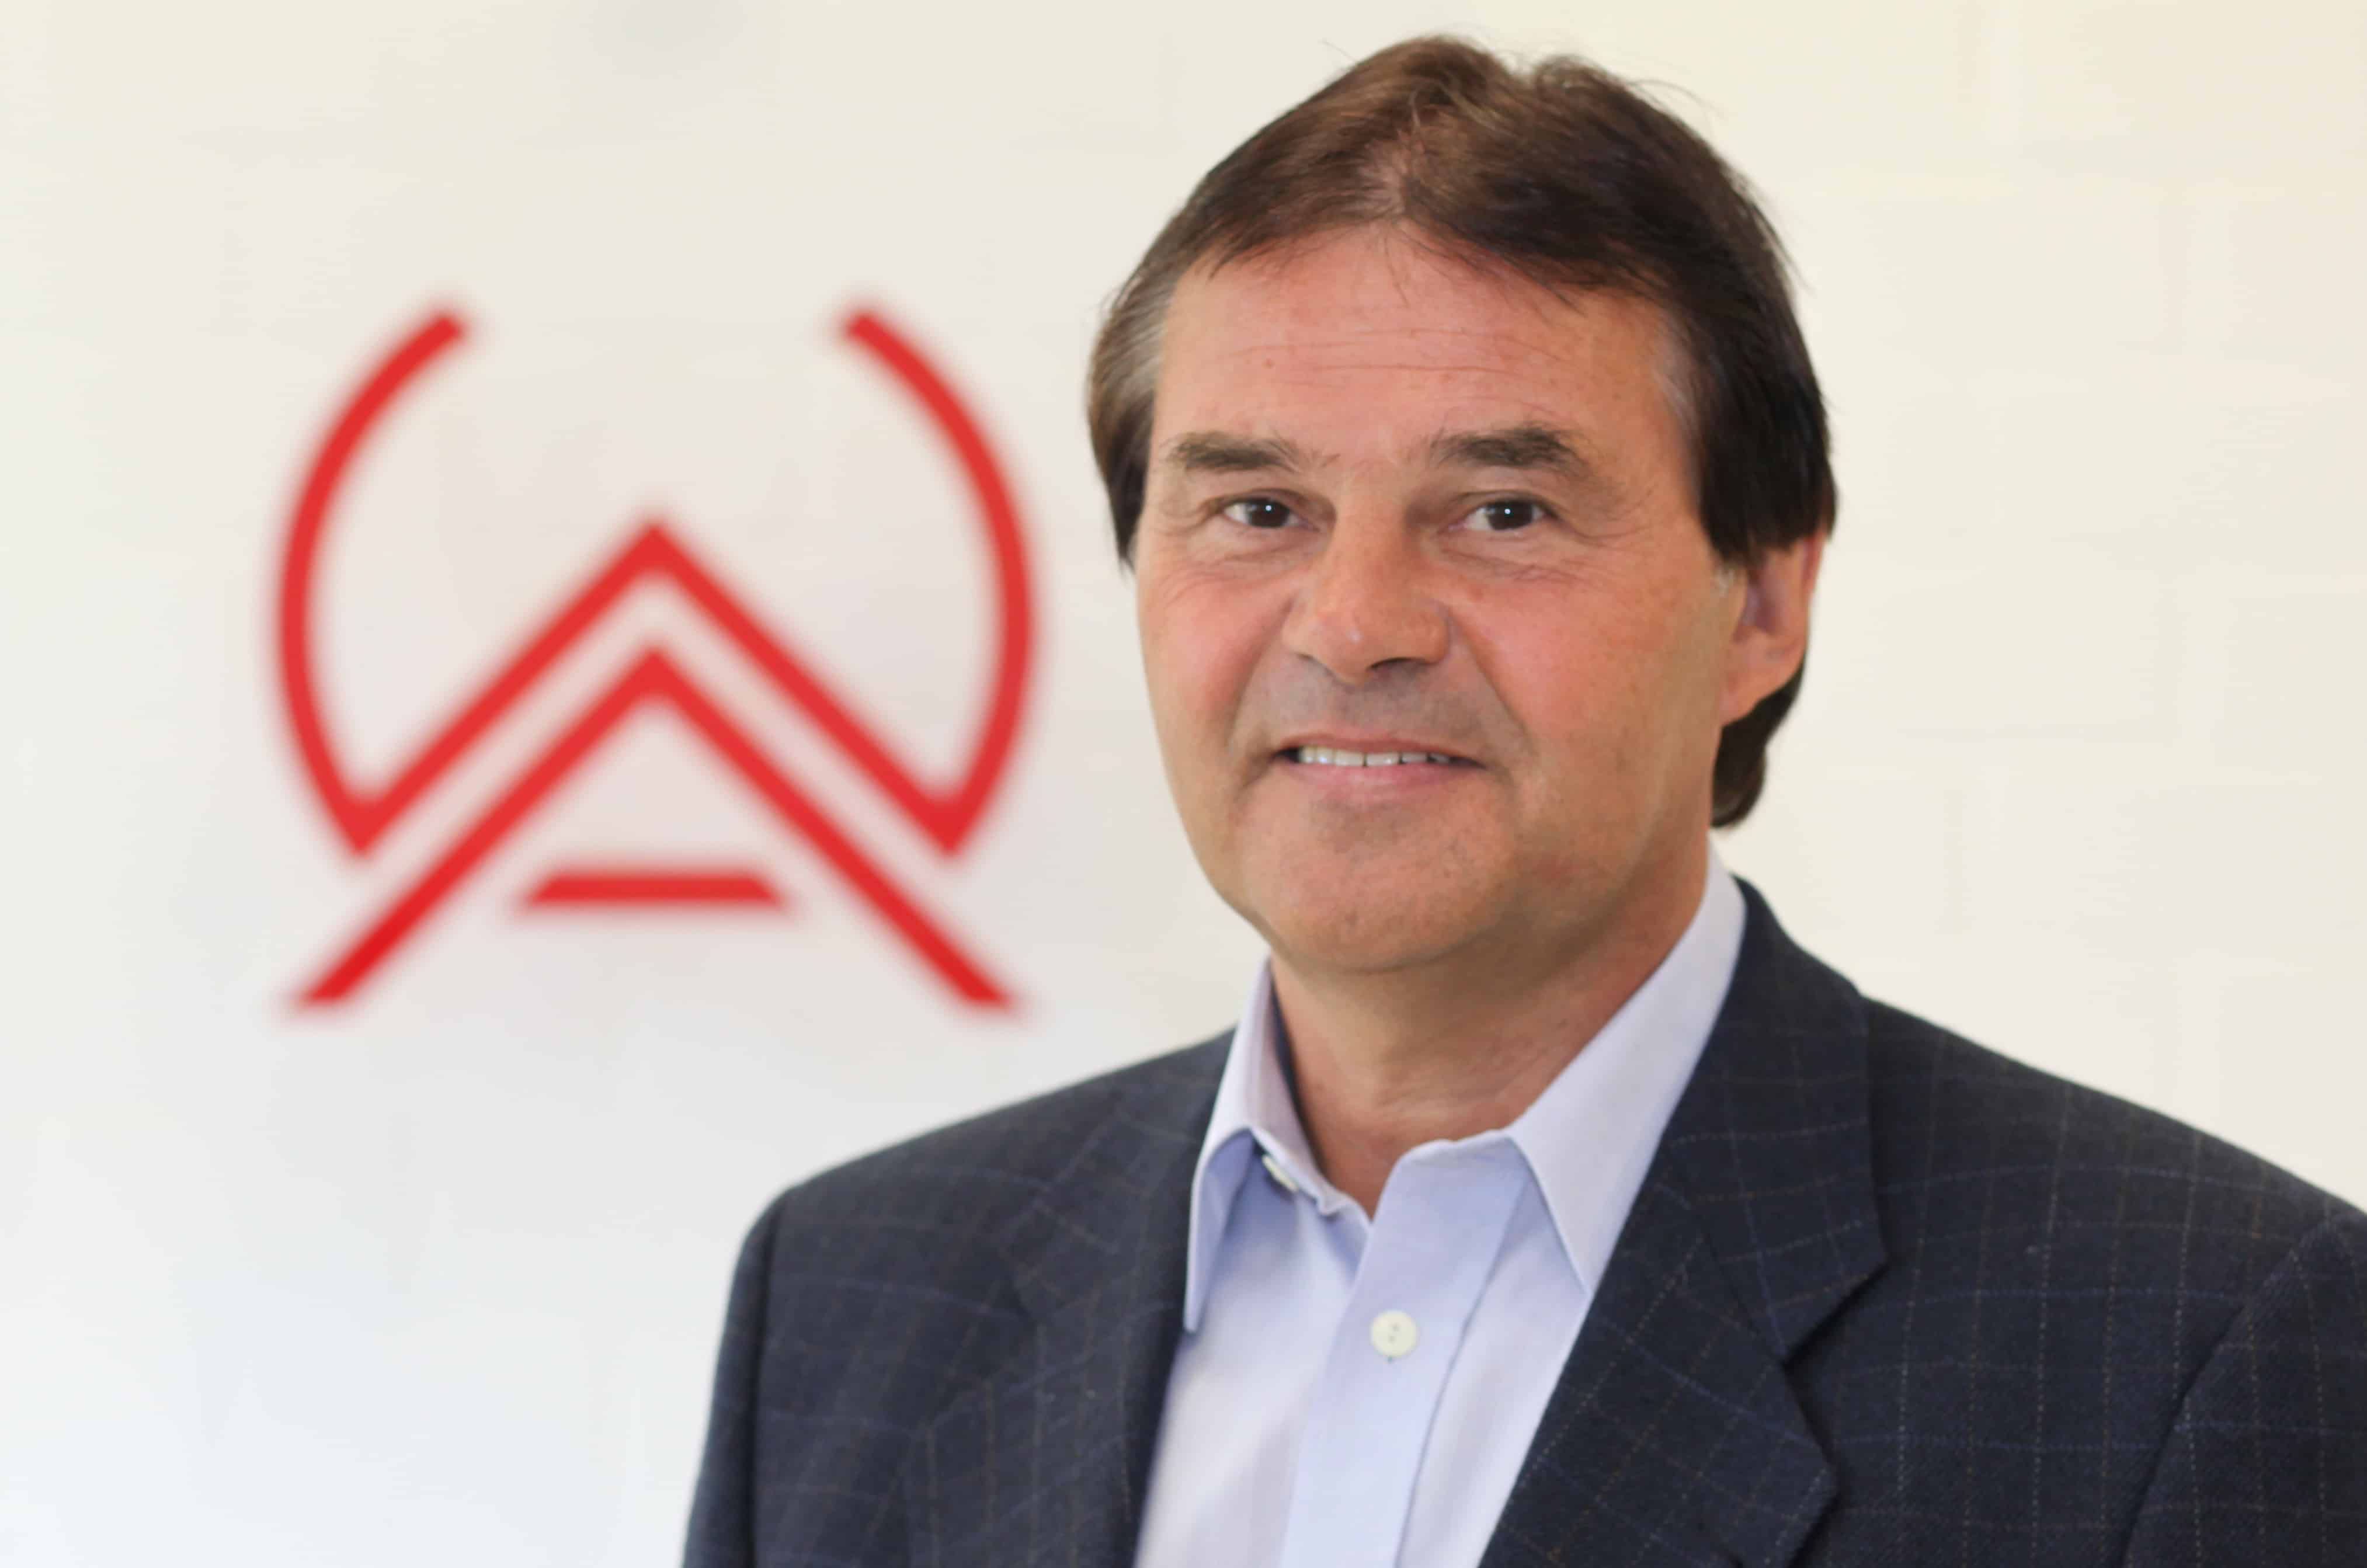 Wilfried Flath